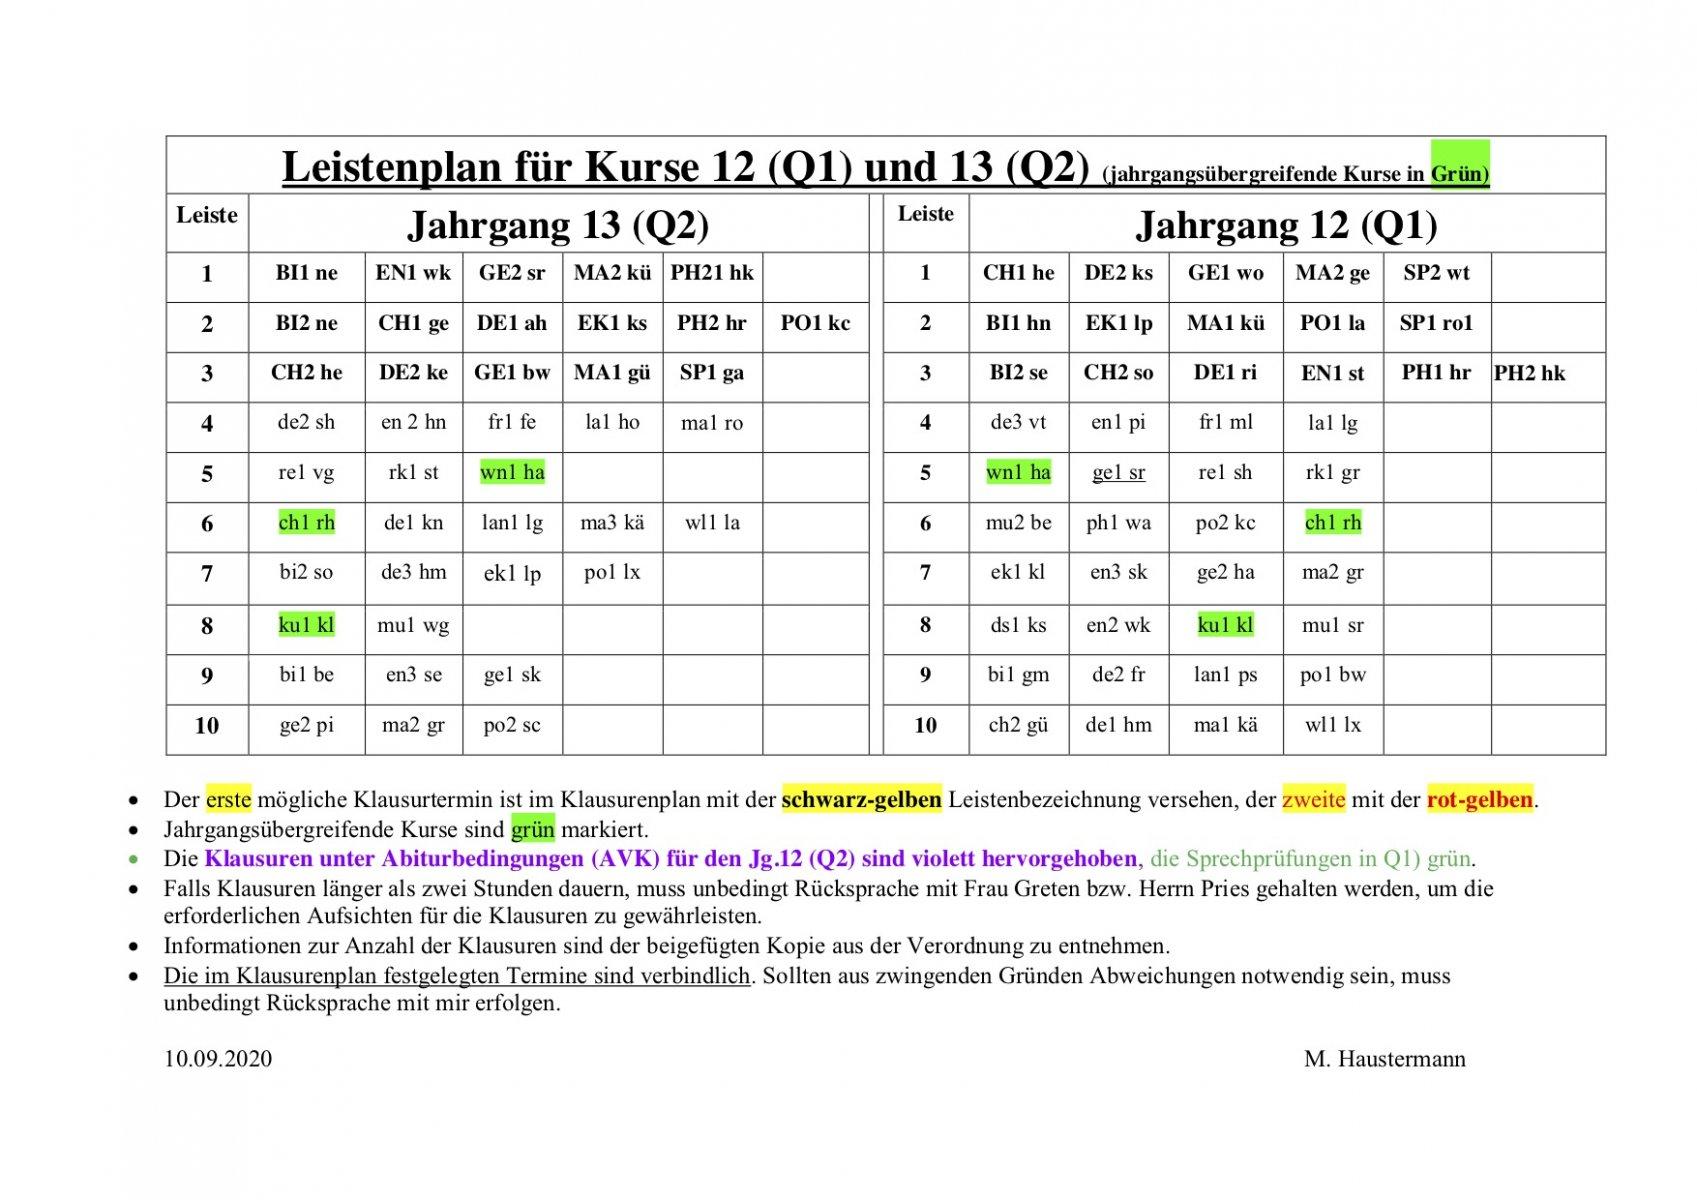 Klausurenplan-V3-2020-2021-HJ1-Seite-1